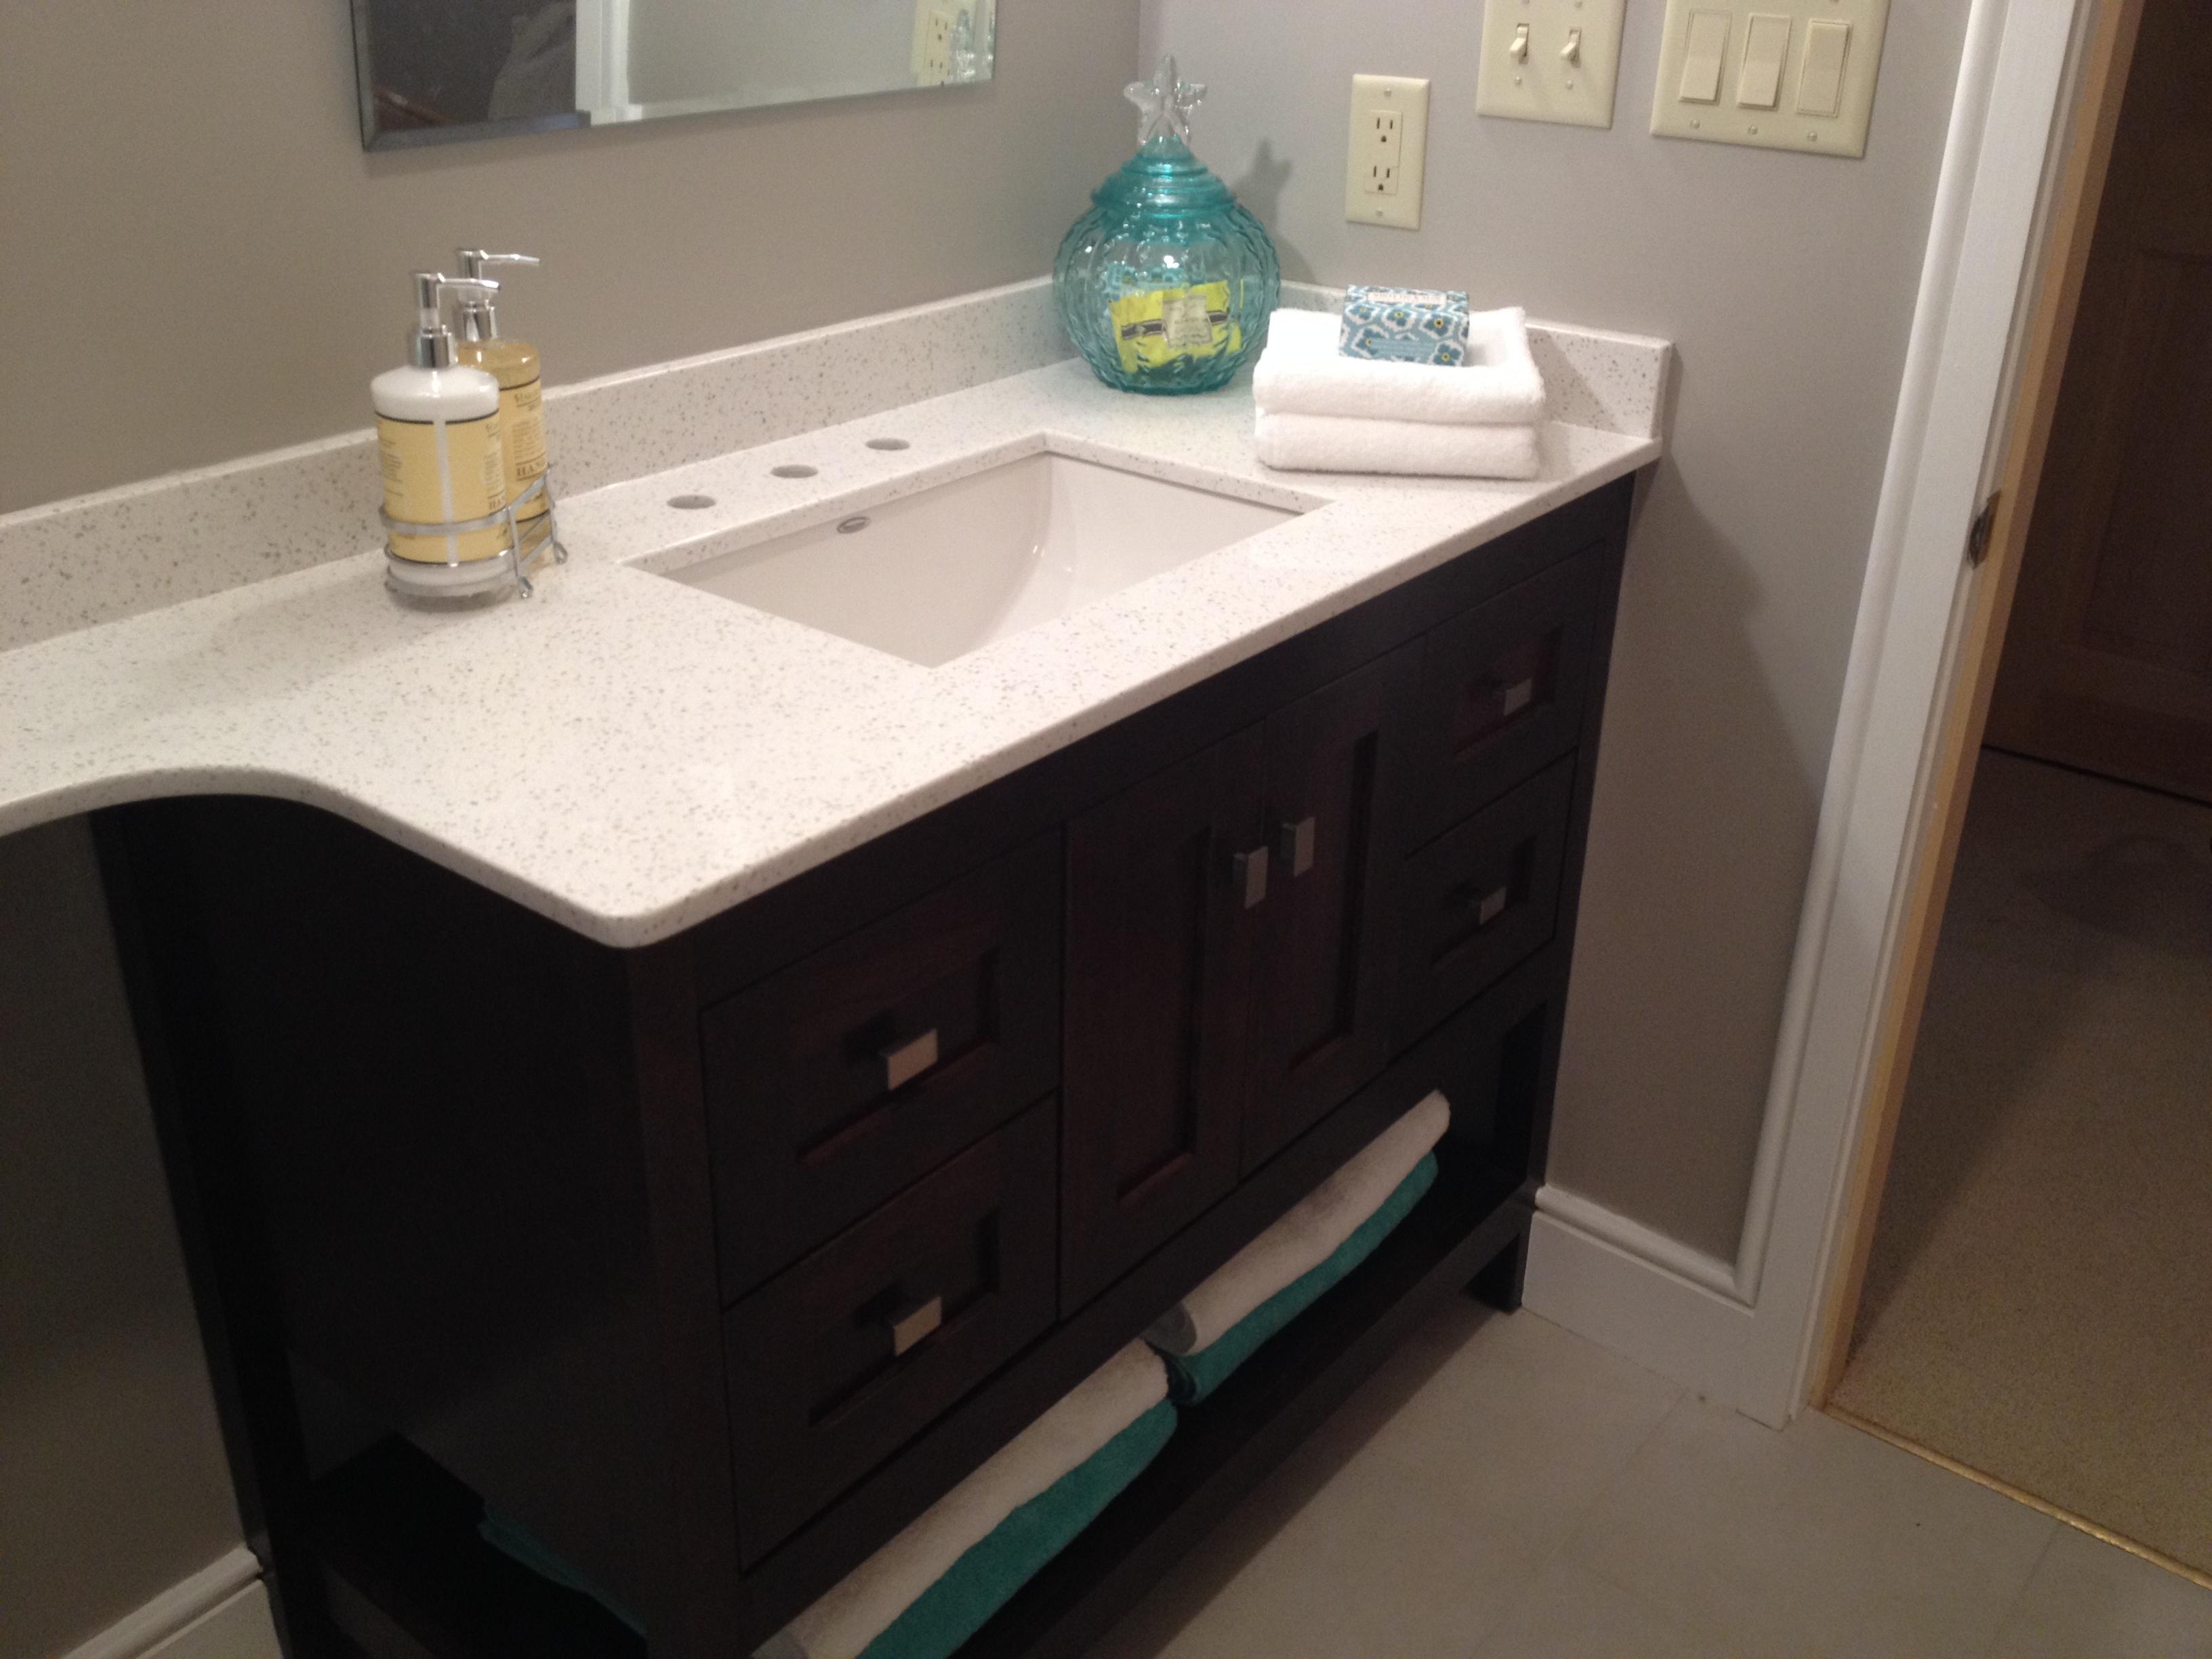 photo of bathroom vanity and countertop